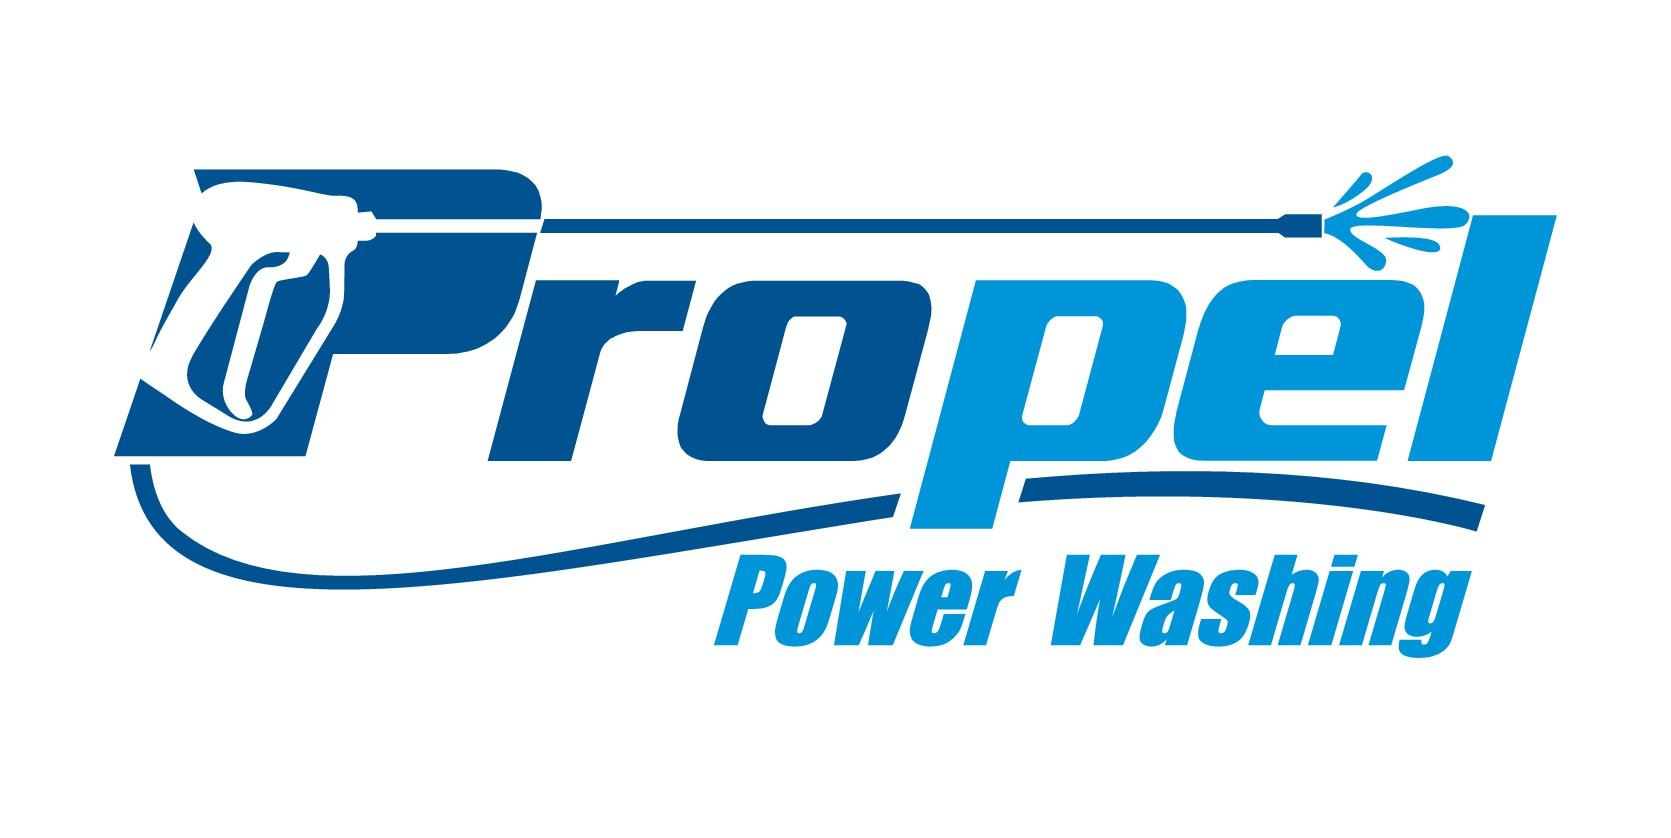 Power washing company needs unique logo think, fortune 100